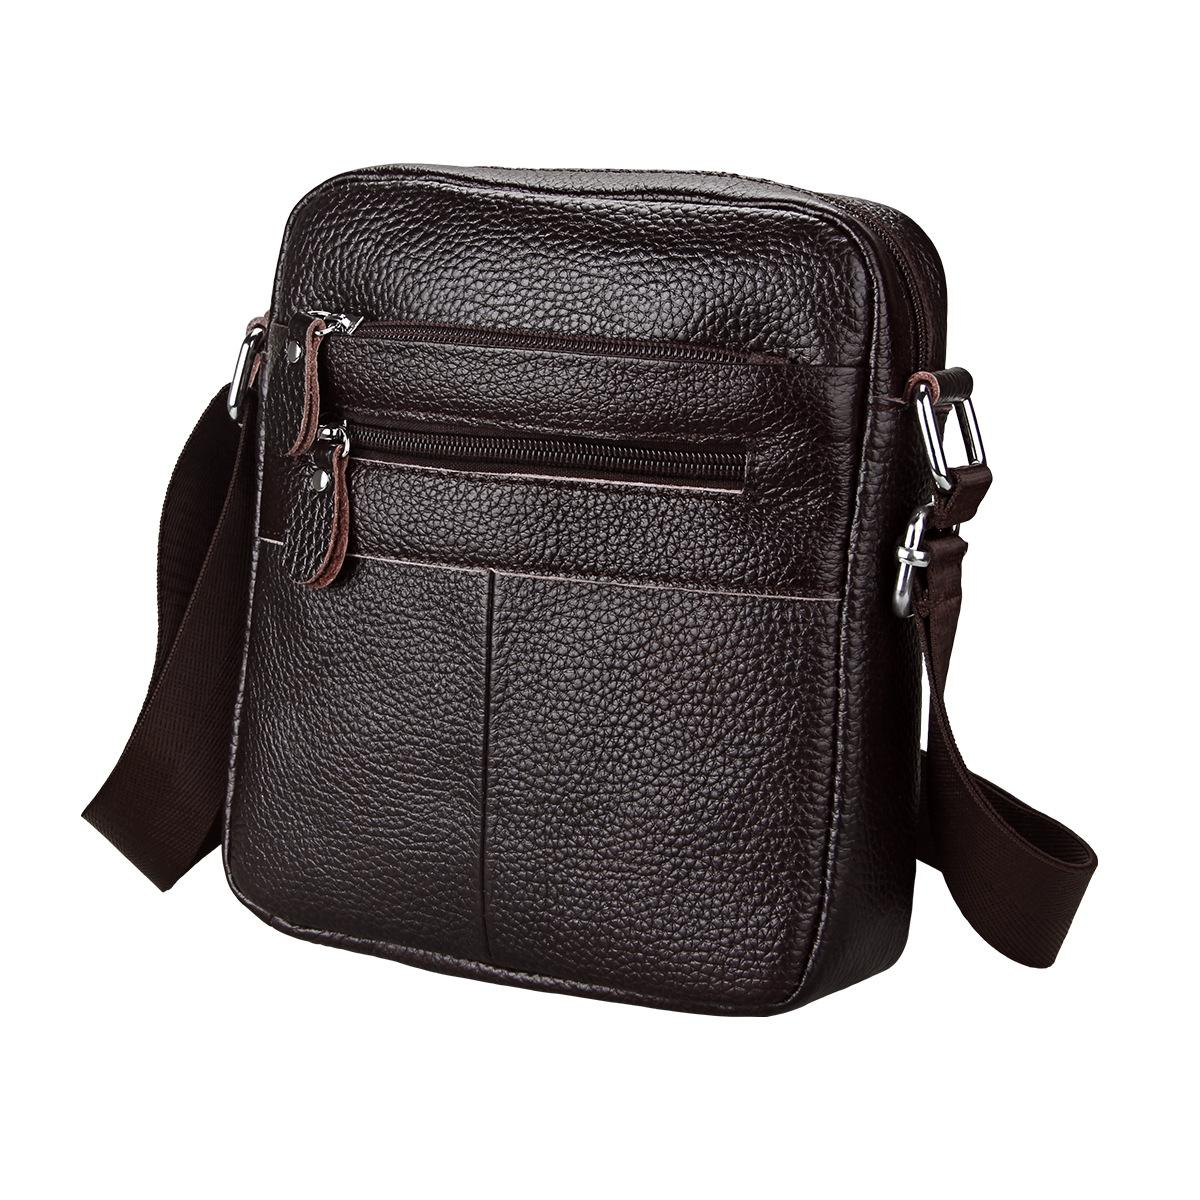 3b81027fda Fashion Men Genuine Leather Men Bag Casual Business Leather Men Messenger  Bag Vintage Men S Crossbody Bag Bolsas Male GW37 Cheap Purses Wholesale  Handbags ...